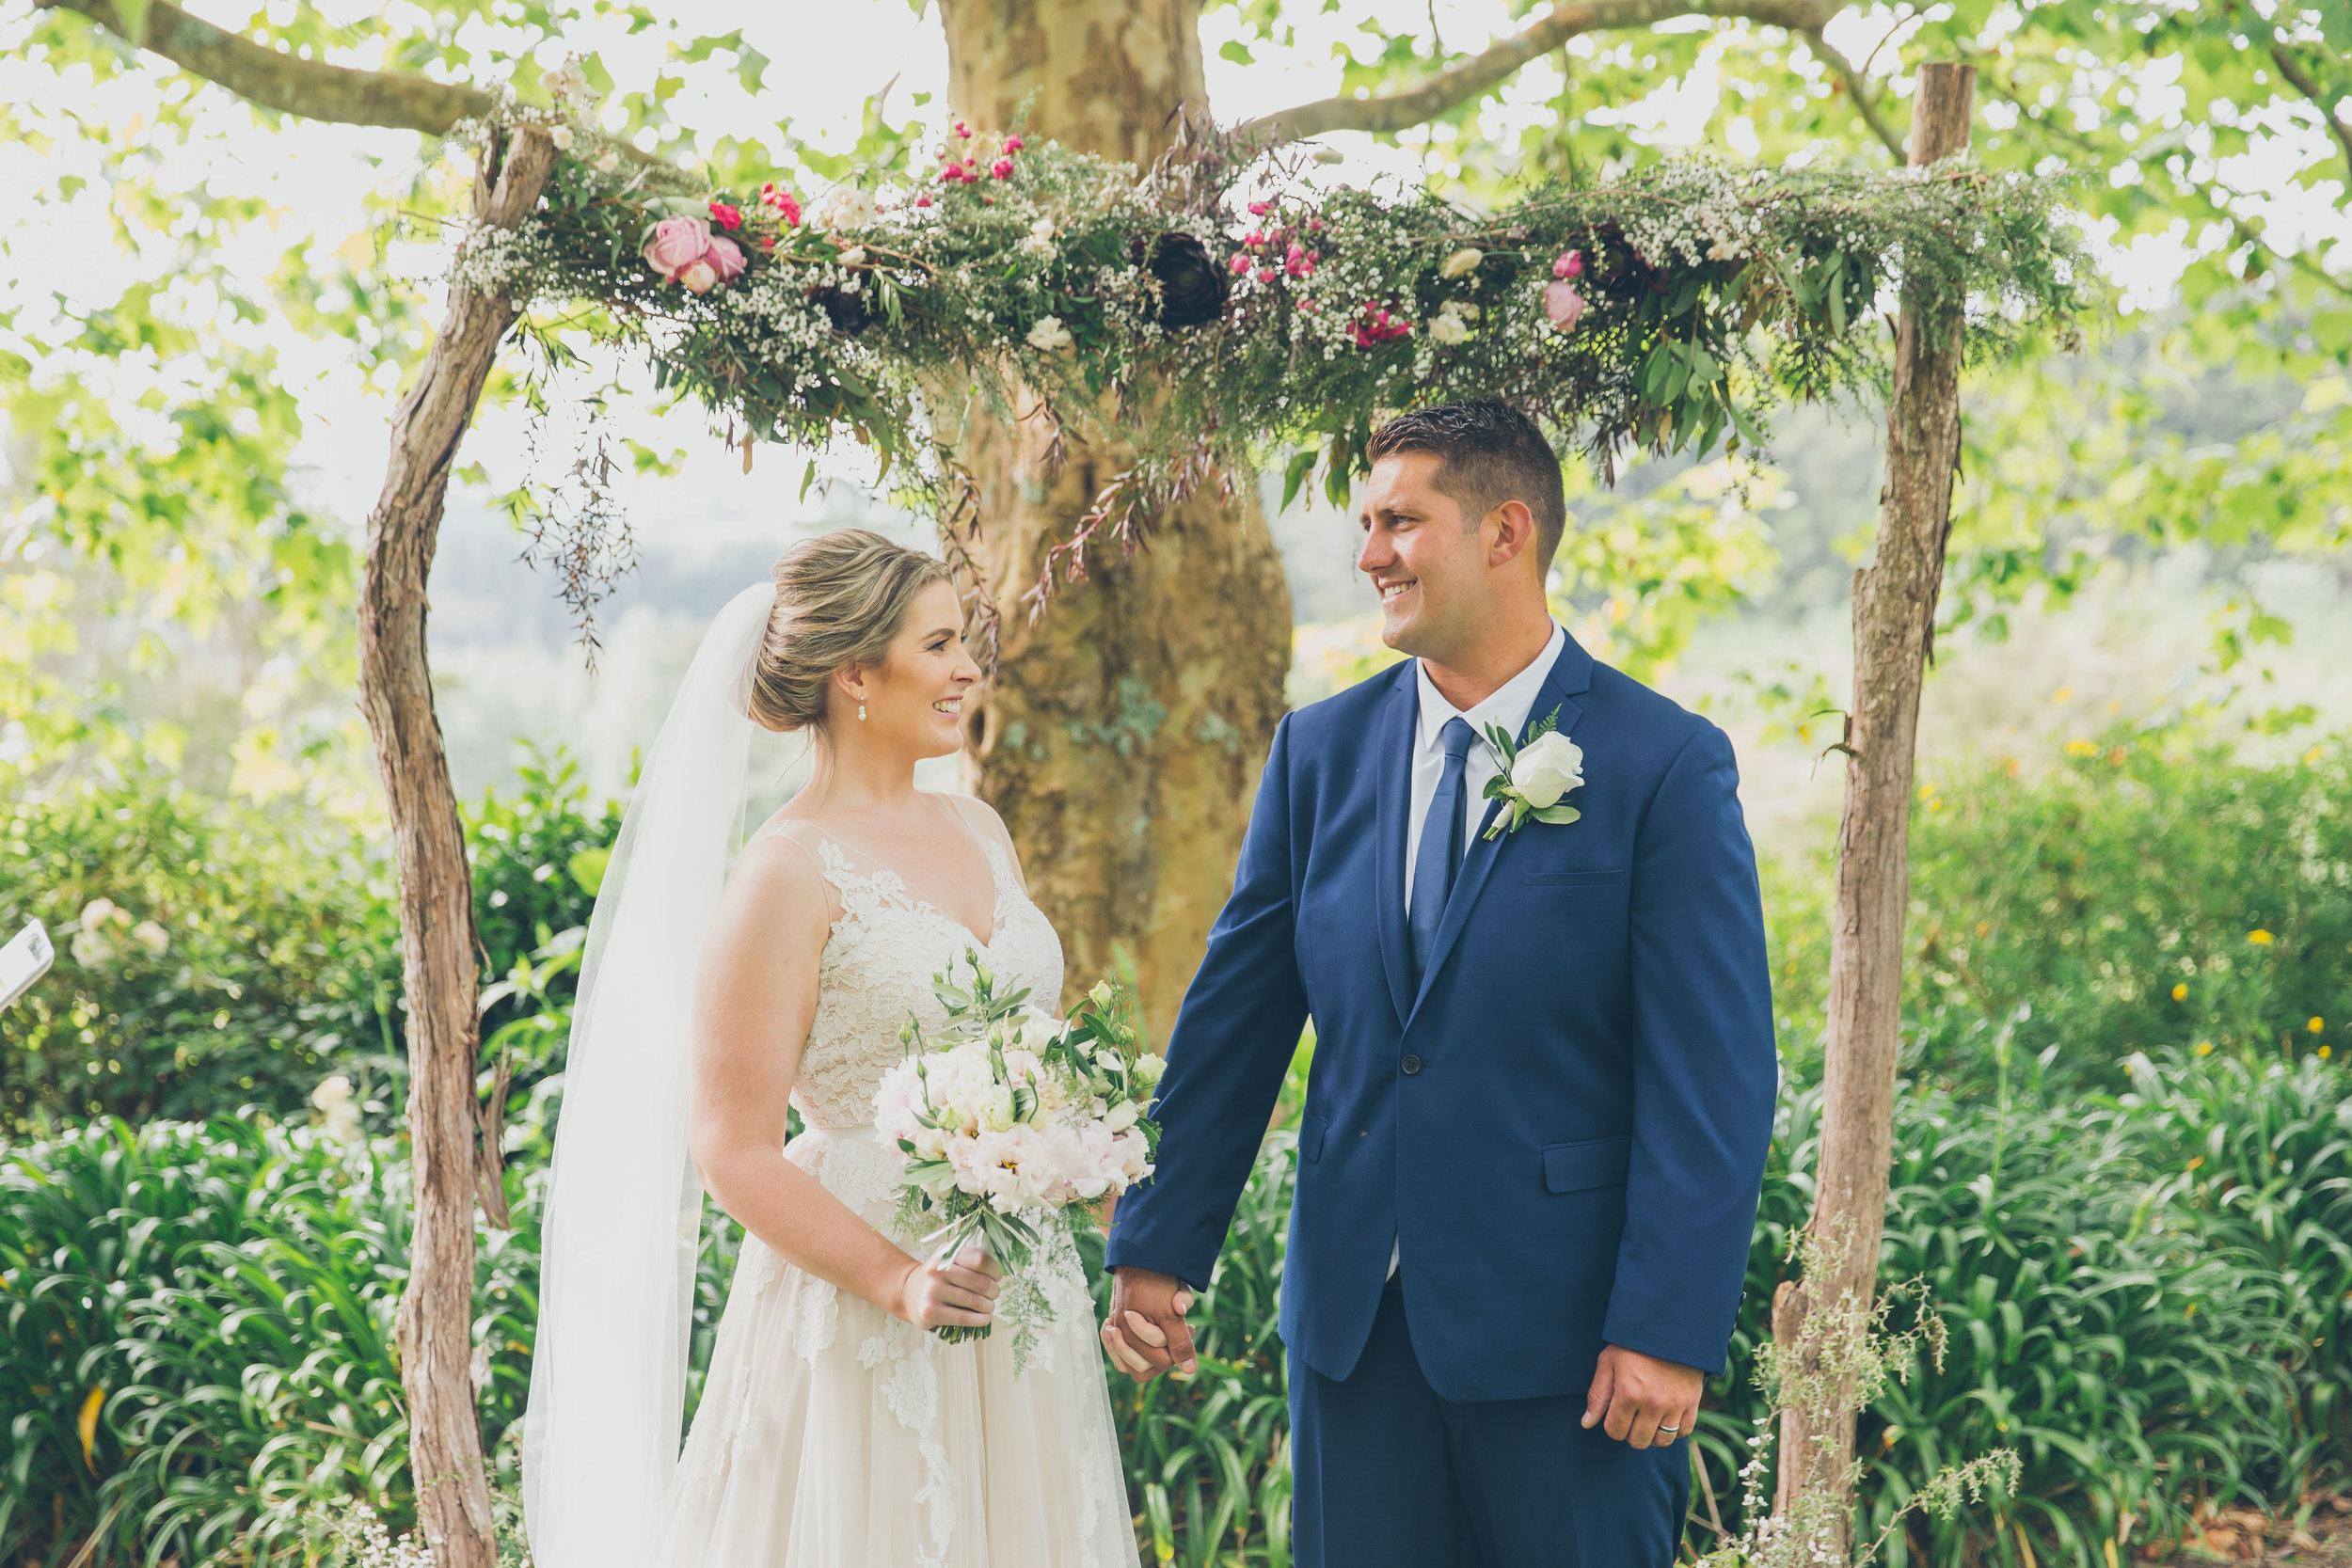 C & J - Wedding - Oh Joy! Photography - Tauranga, New Zealand-3.jpg